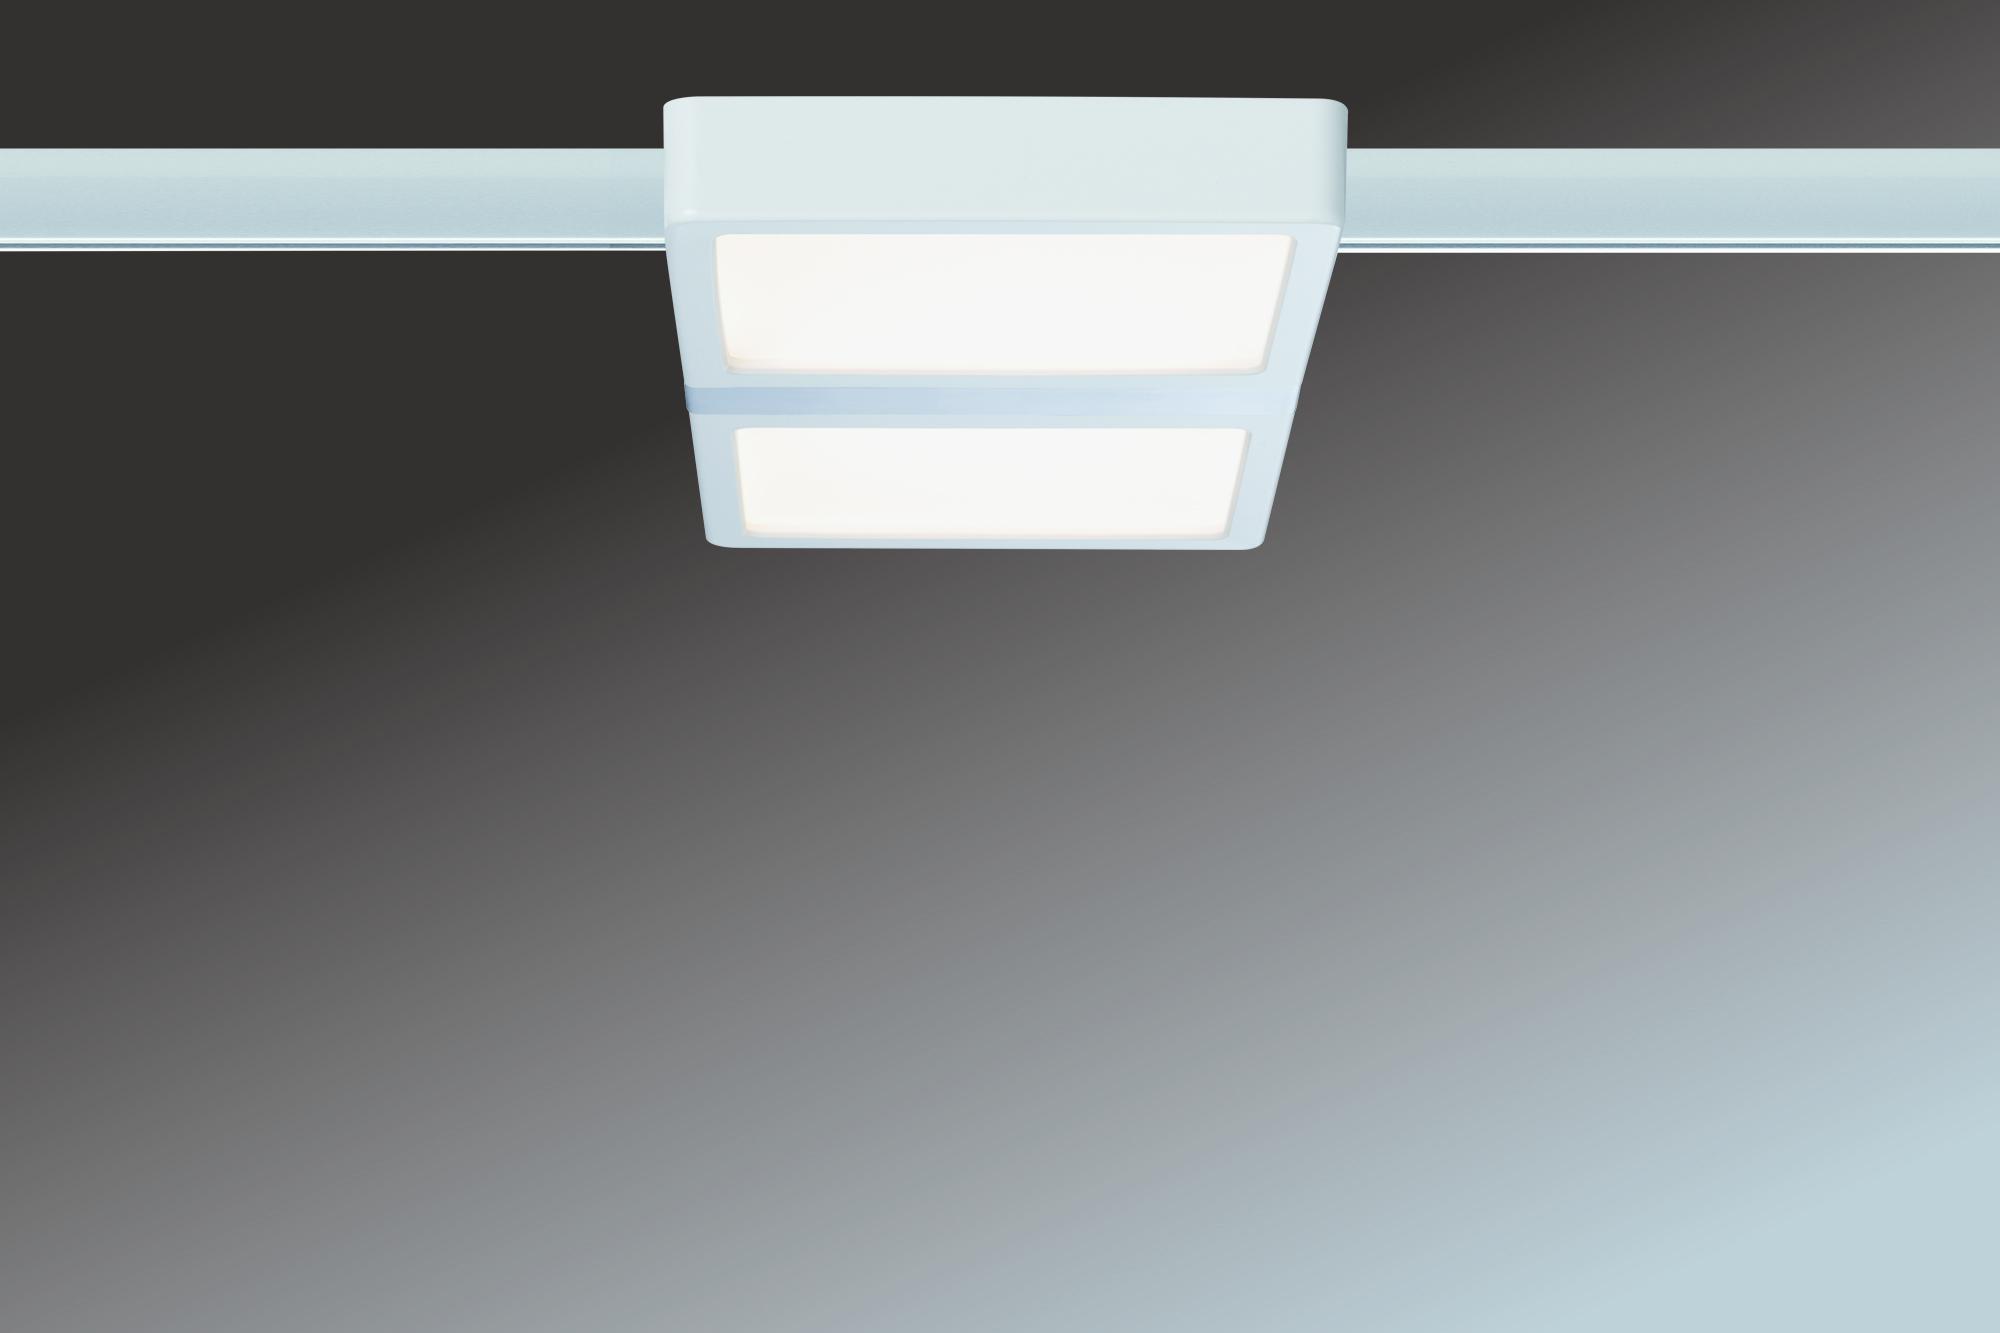 paulmann urail led panel double 9w 230v 17va 2700k wei online kaufen im voltus. Black Bedroom Furniture Sets. Home Design Ideas